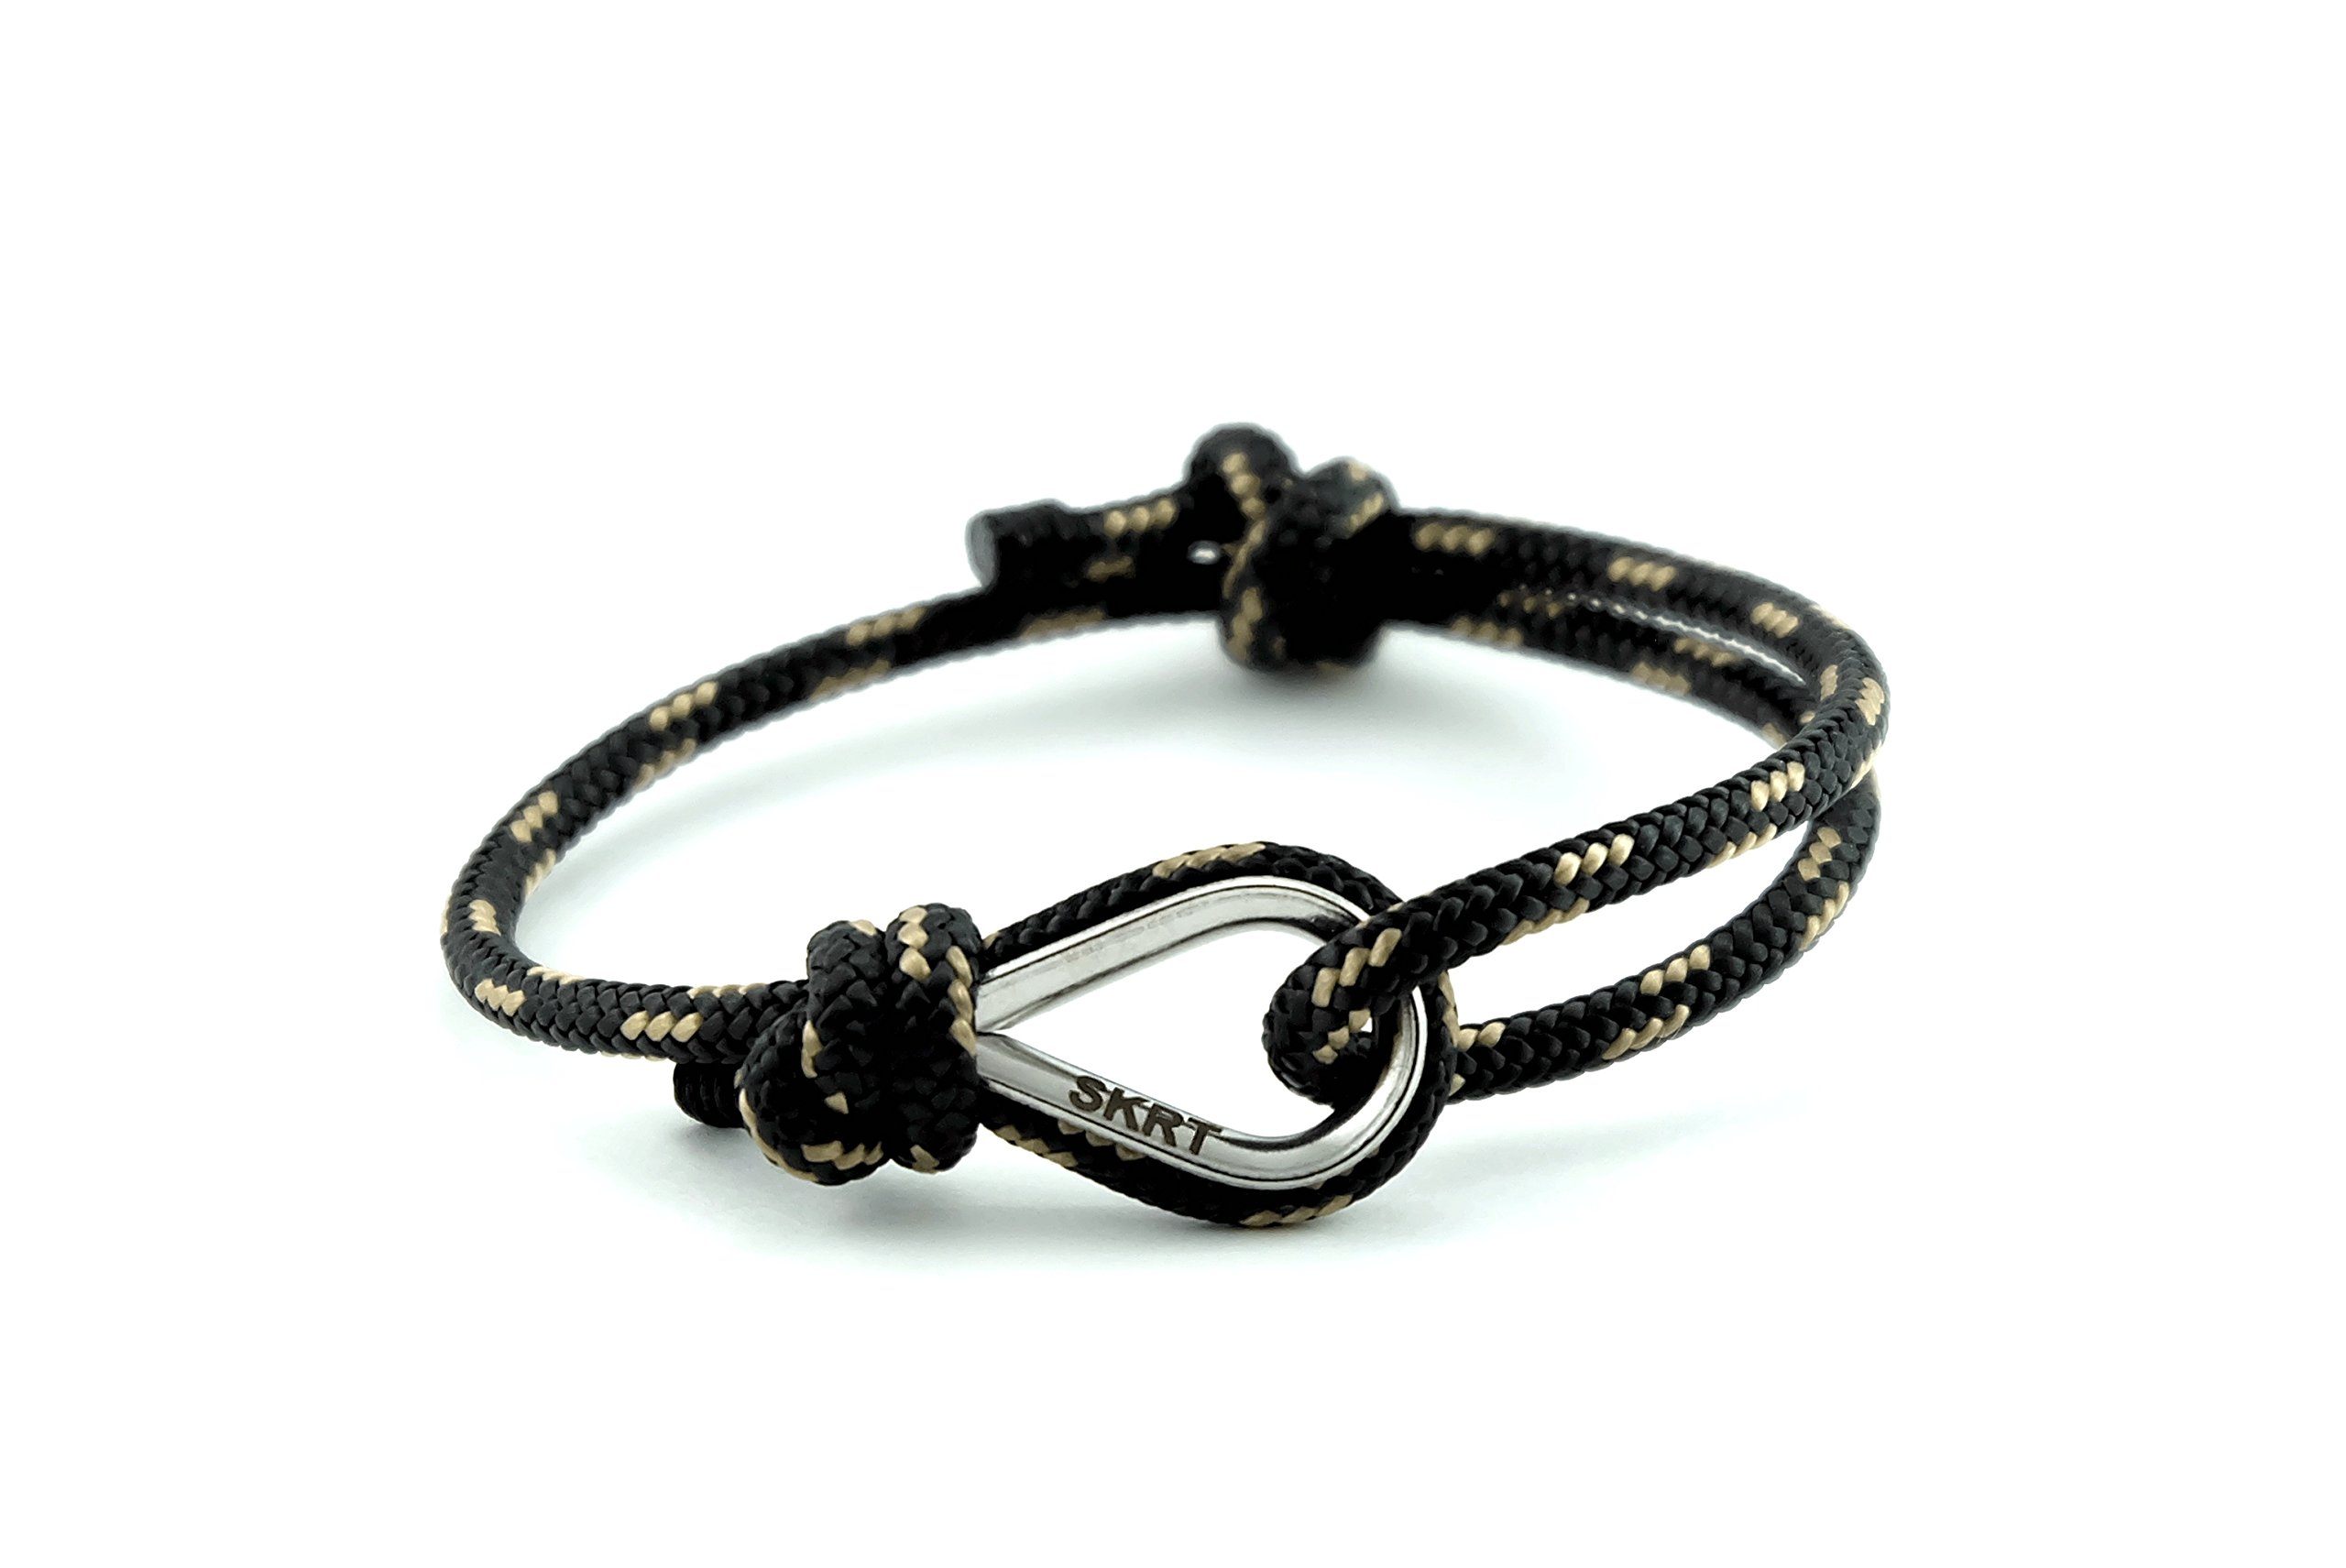 Handmade Nautical Bracelet Made in Europe, Unisex, Adjustable size (Bravo 3rd India / Black)